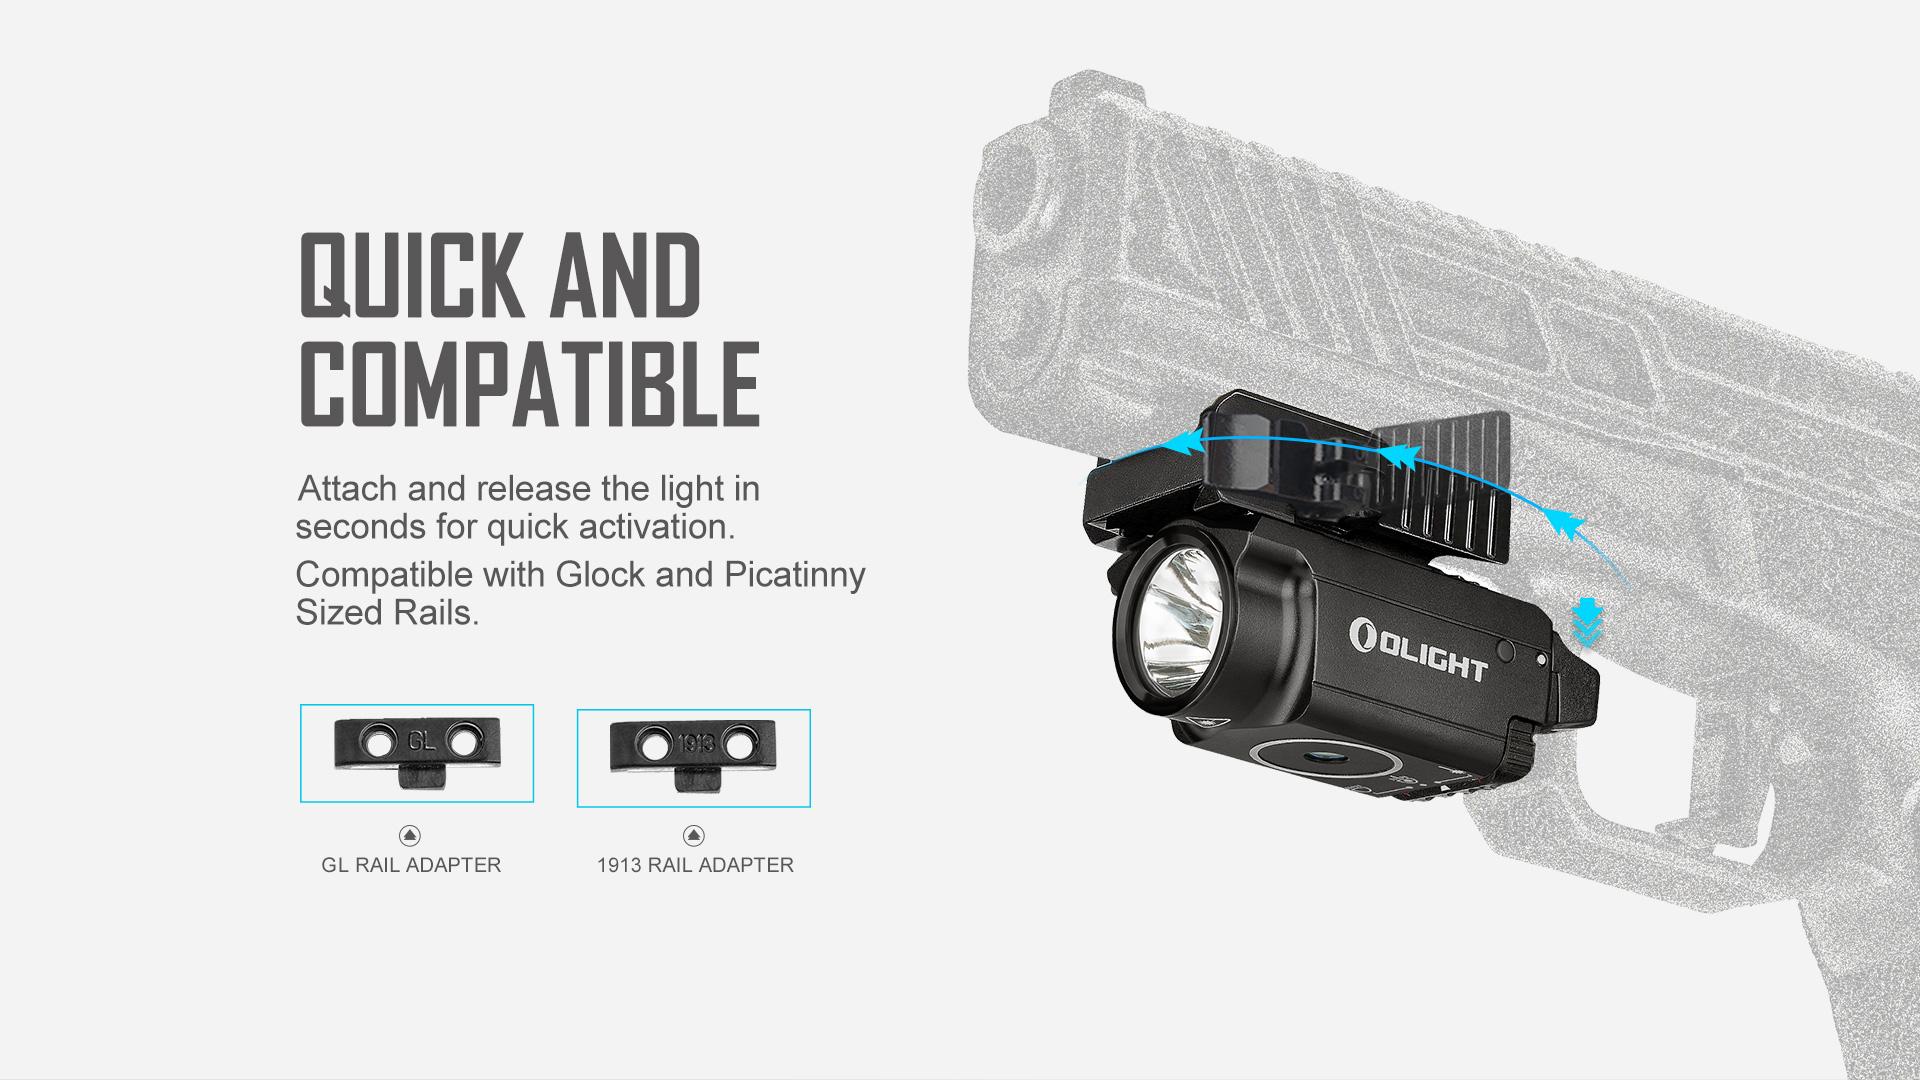 Baldr RL Mini Tactical Laser Flashlight quick and compatible